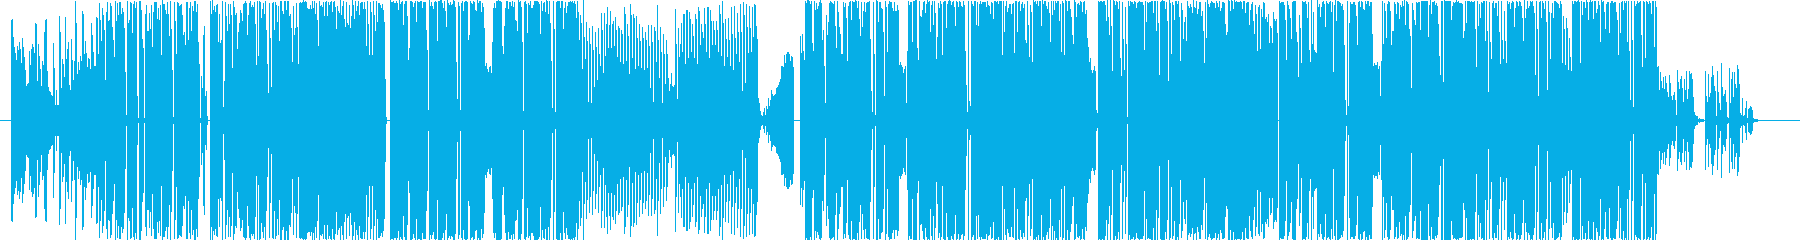 Kawaii、エレクトロポップの再生済みの波形